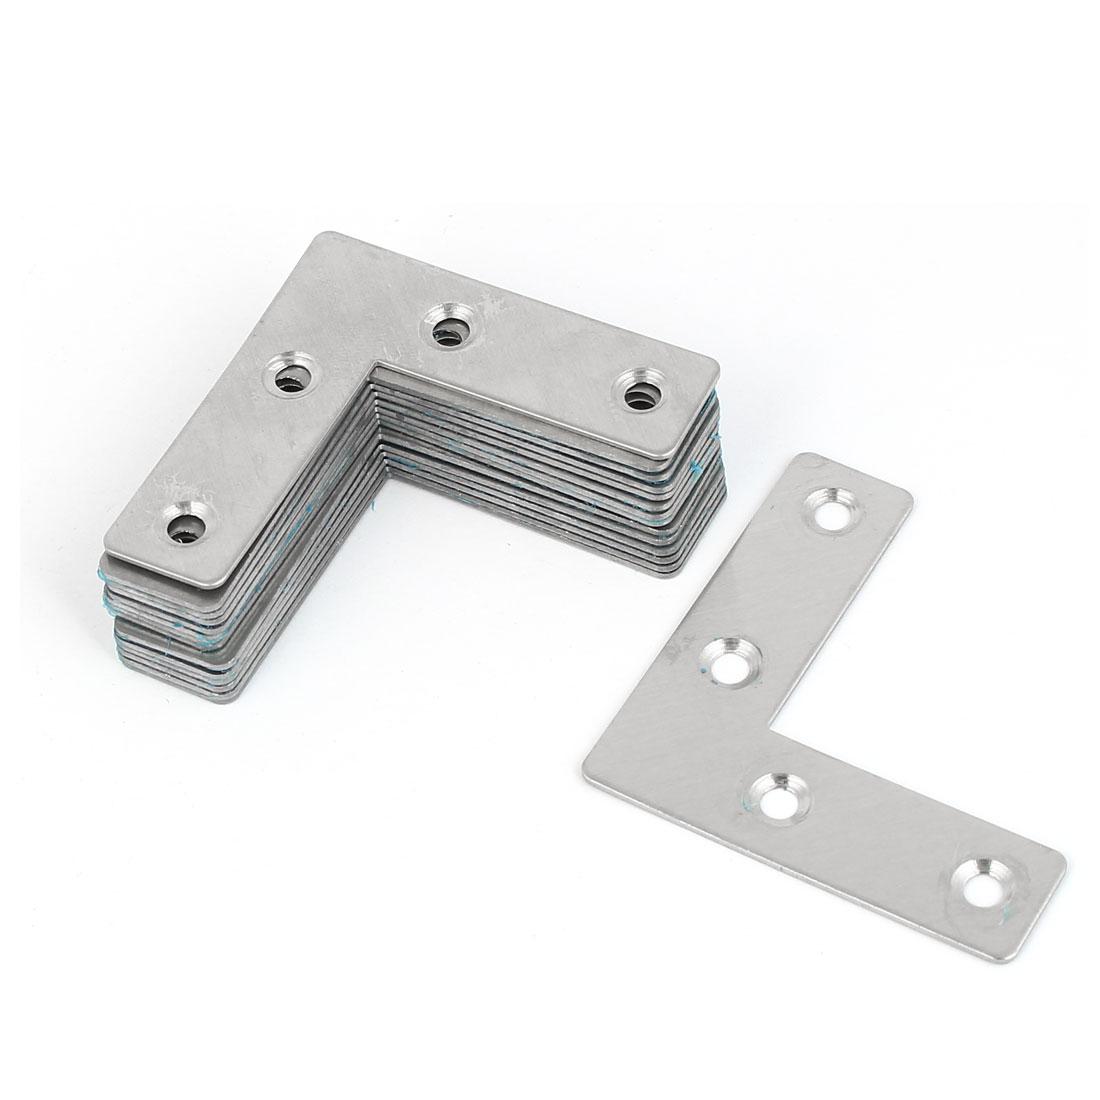 51mmx51mm 90 Degree L Shaped Stainless Steel Angle Bracket Corner Brace 15 Pcs